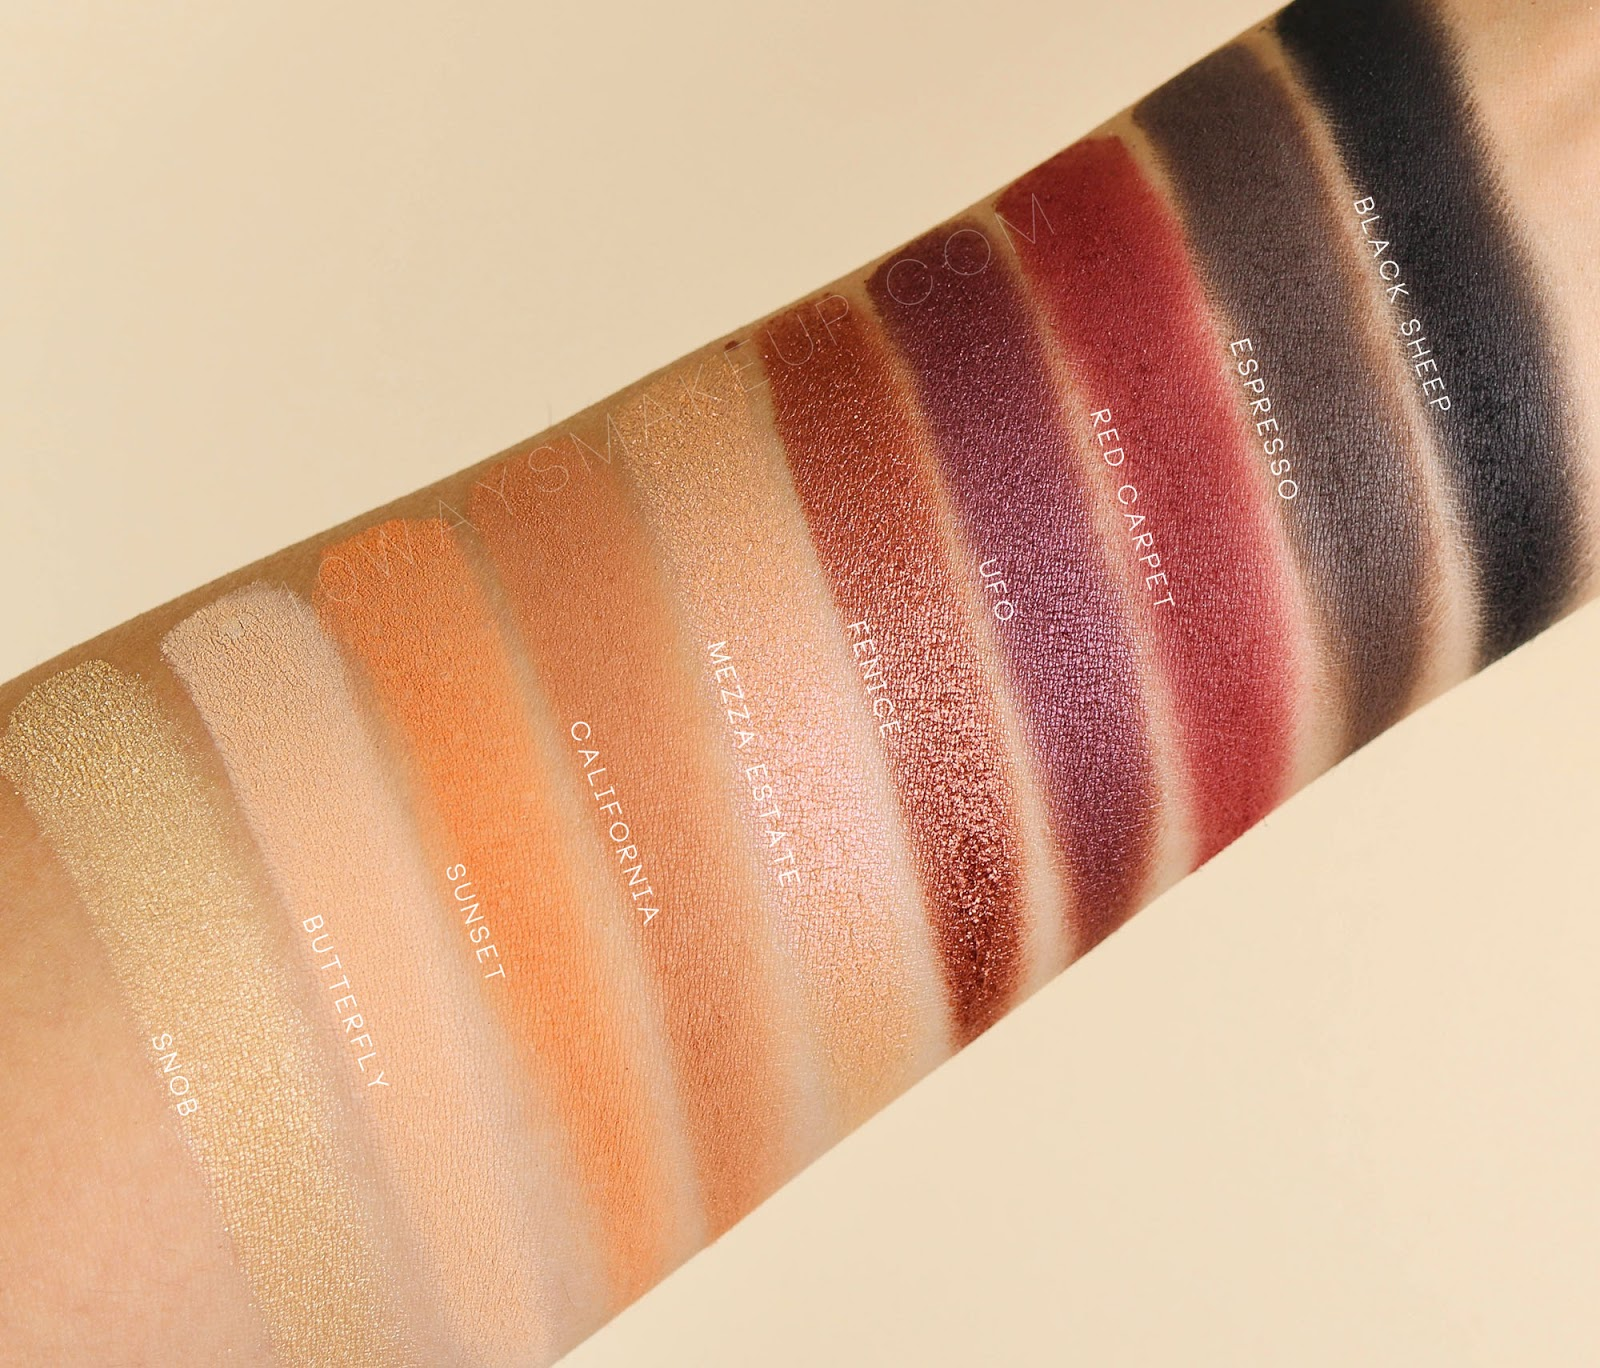 Neve Cosmetics Amber Wonderland palette swatch